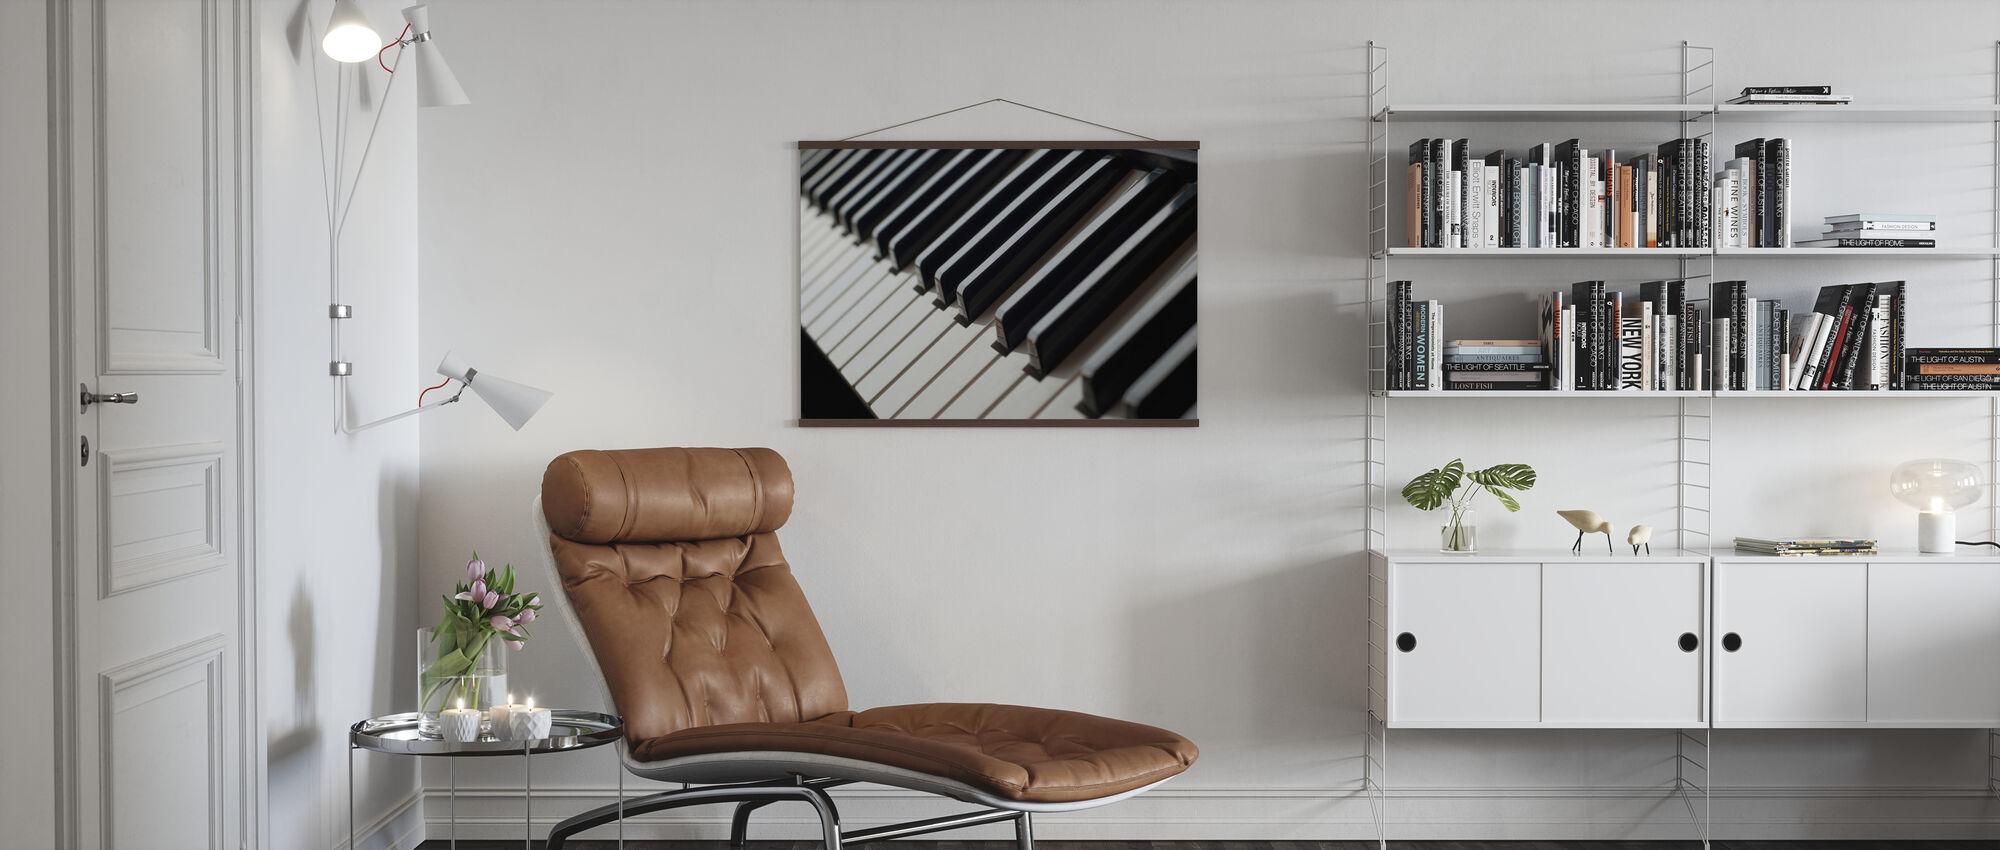 Clavier Piano - Affiche - Salle à manger